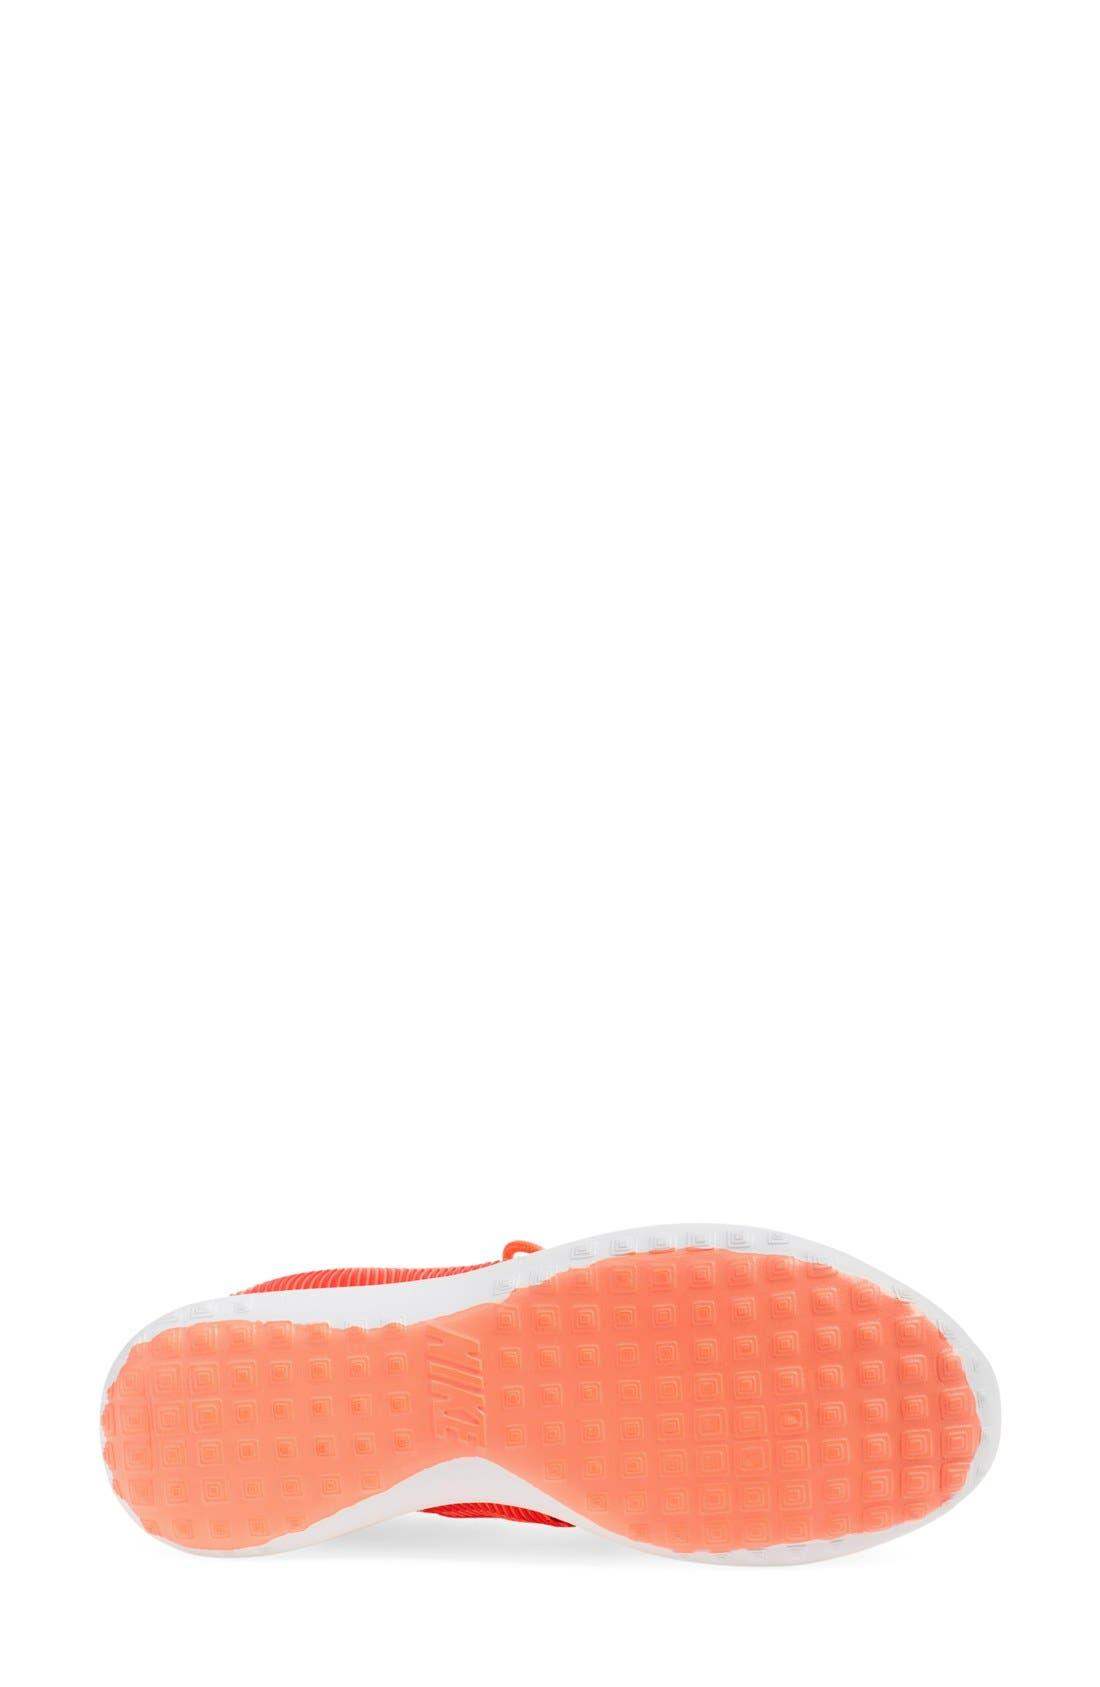 Juvenate Sneaker,                             Alternate thumbnail 203, color,